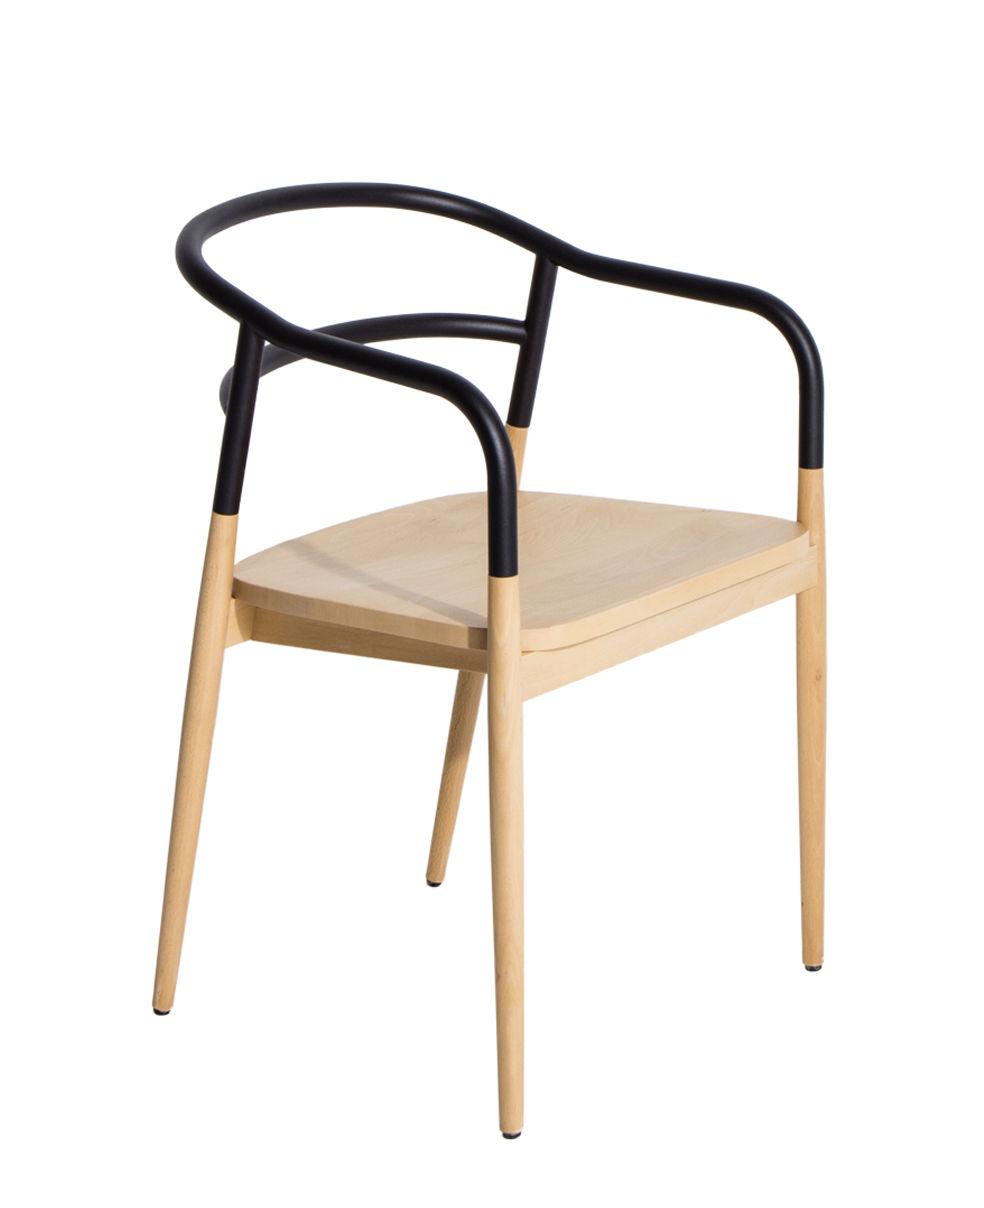 Furniture - Chairs - Dojo Armchair - / Beech & steel by Petite Friture - Beechwood / Black - Beechwood, Painted steel